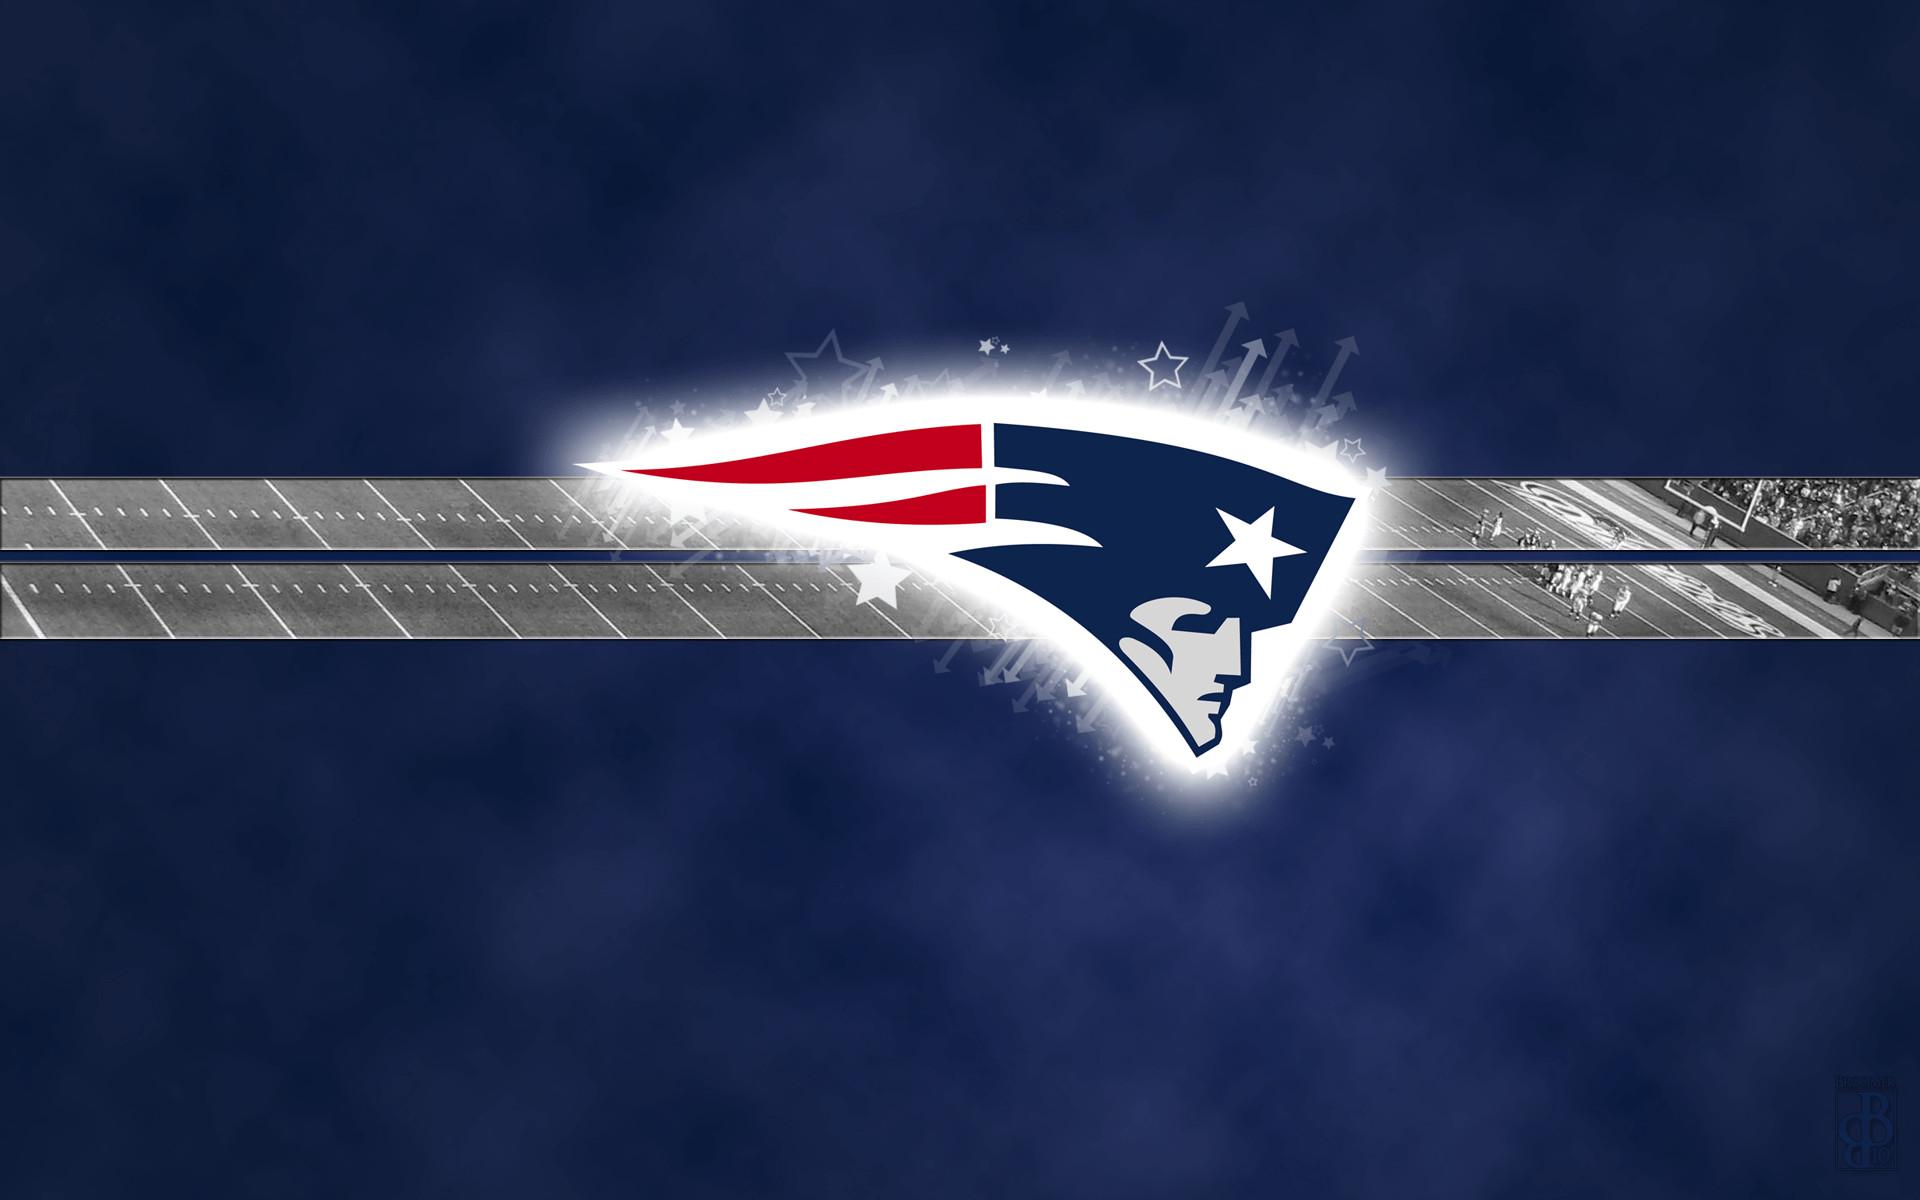 New England Patriots 2015 NFL / Wallpaper Sport 95666 high quality .